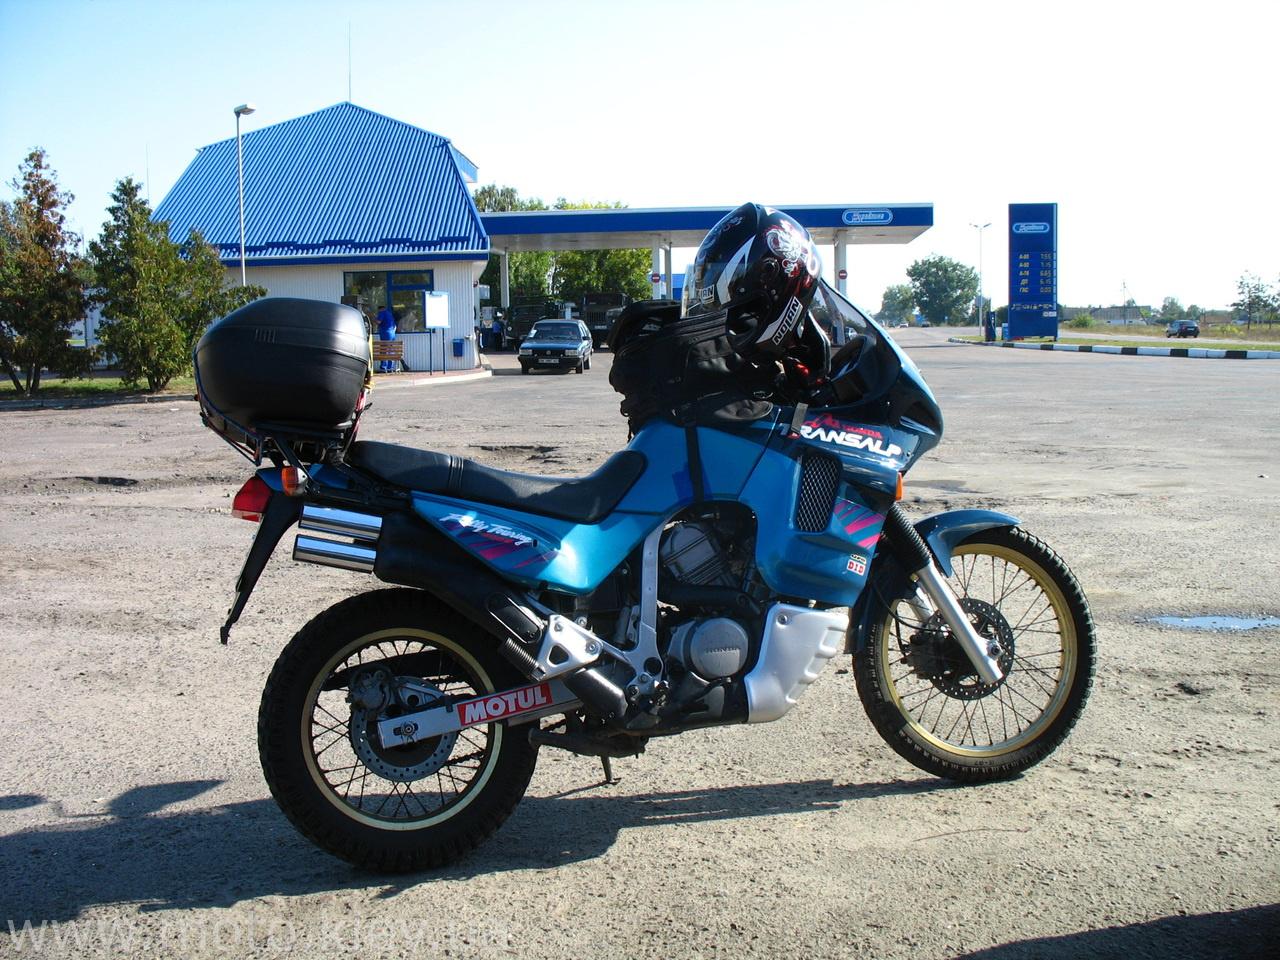 Мотоцикл  Honda Transalp 400  3700 USD Торг